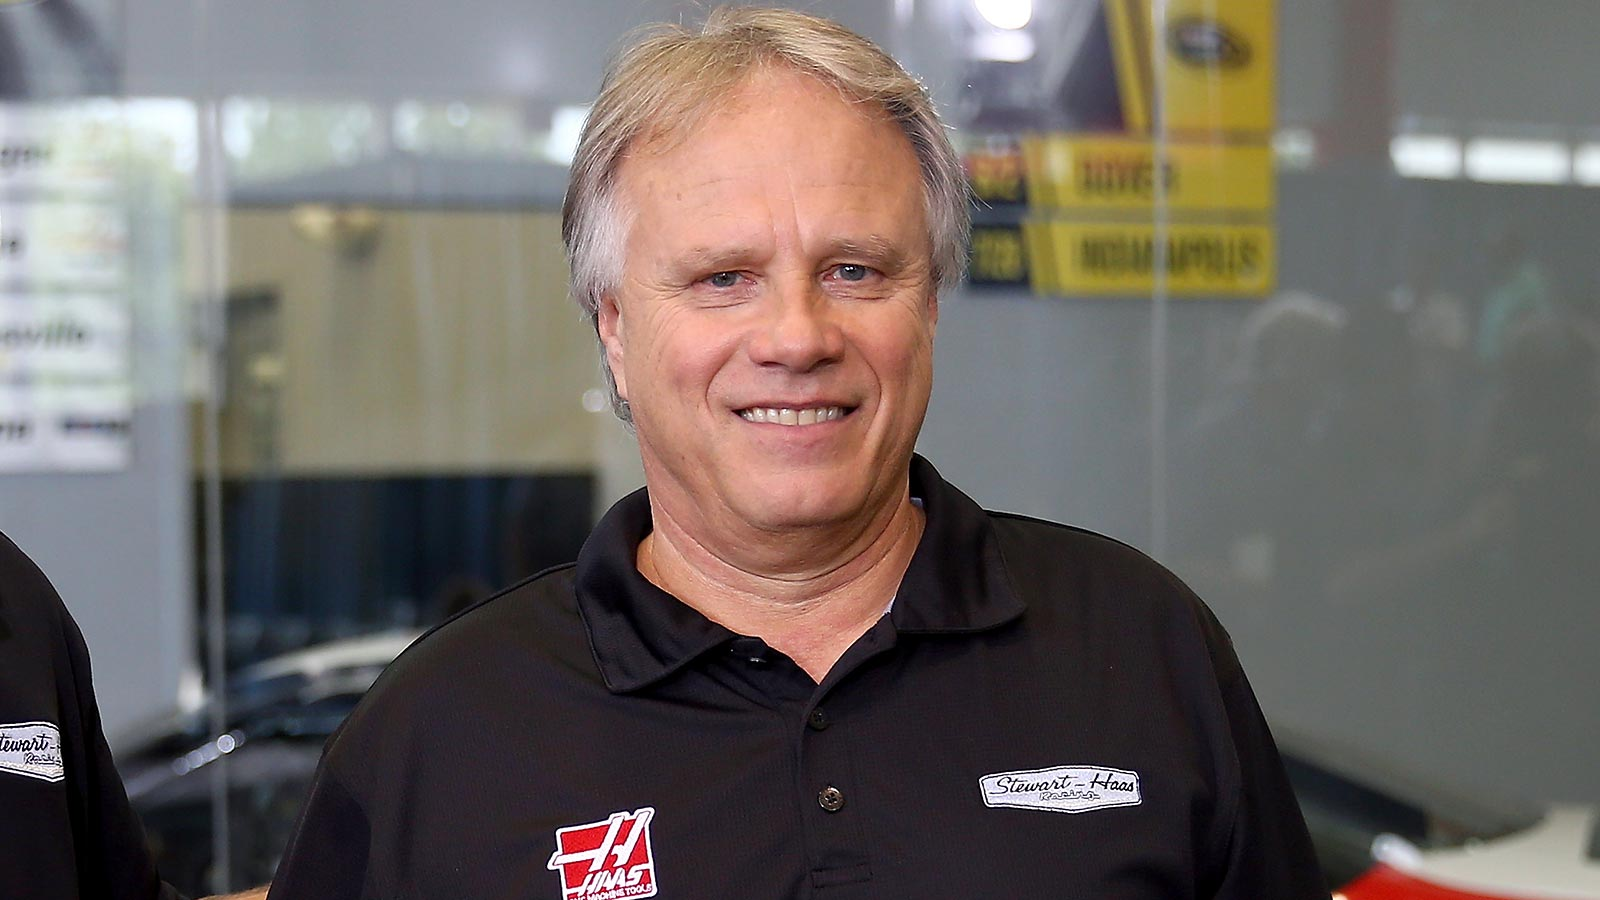 Stewart-Haas Racing Press Conference